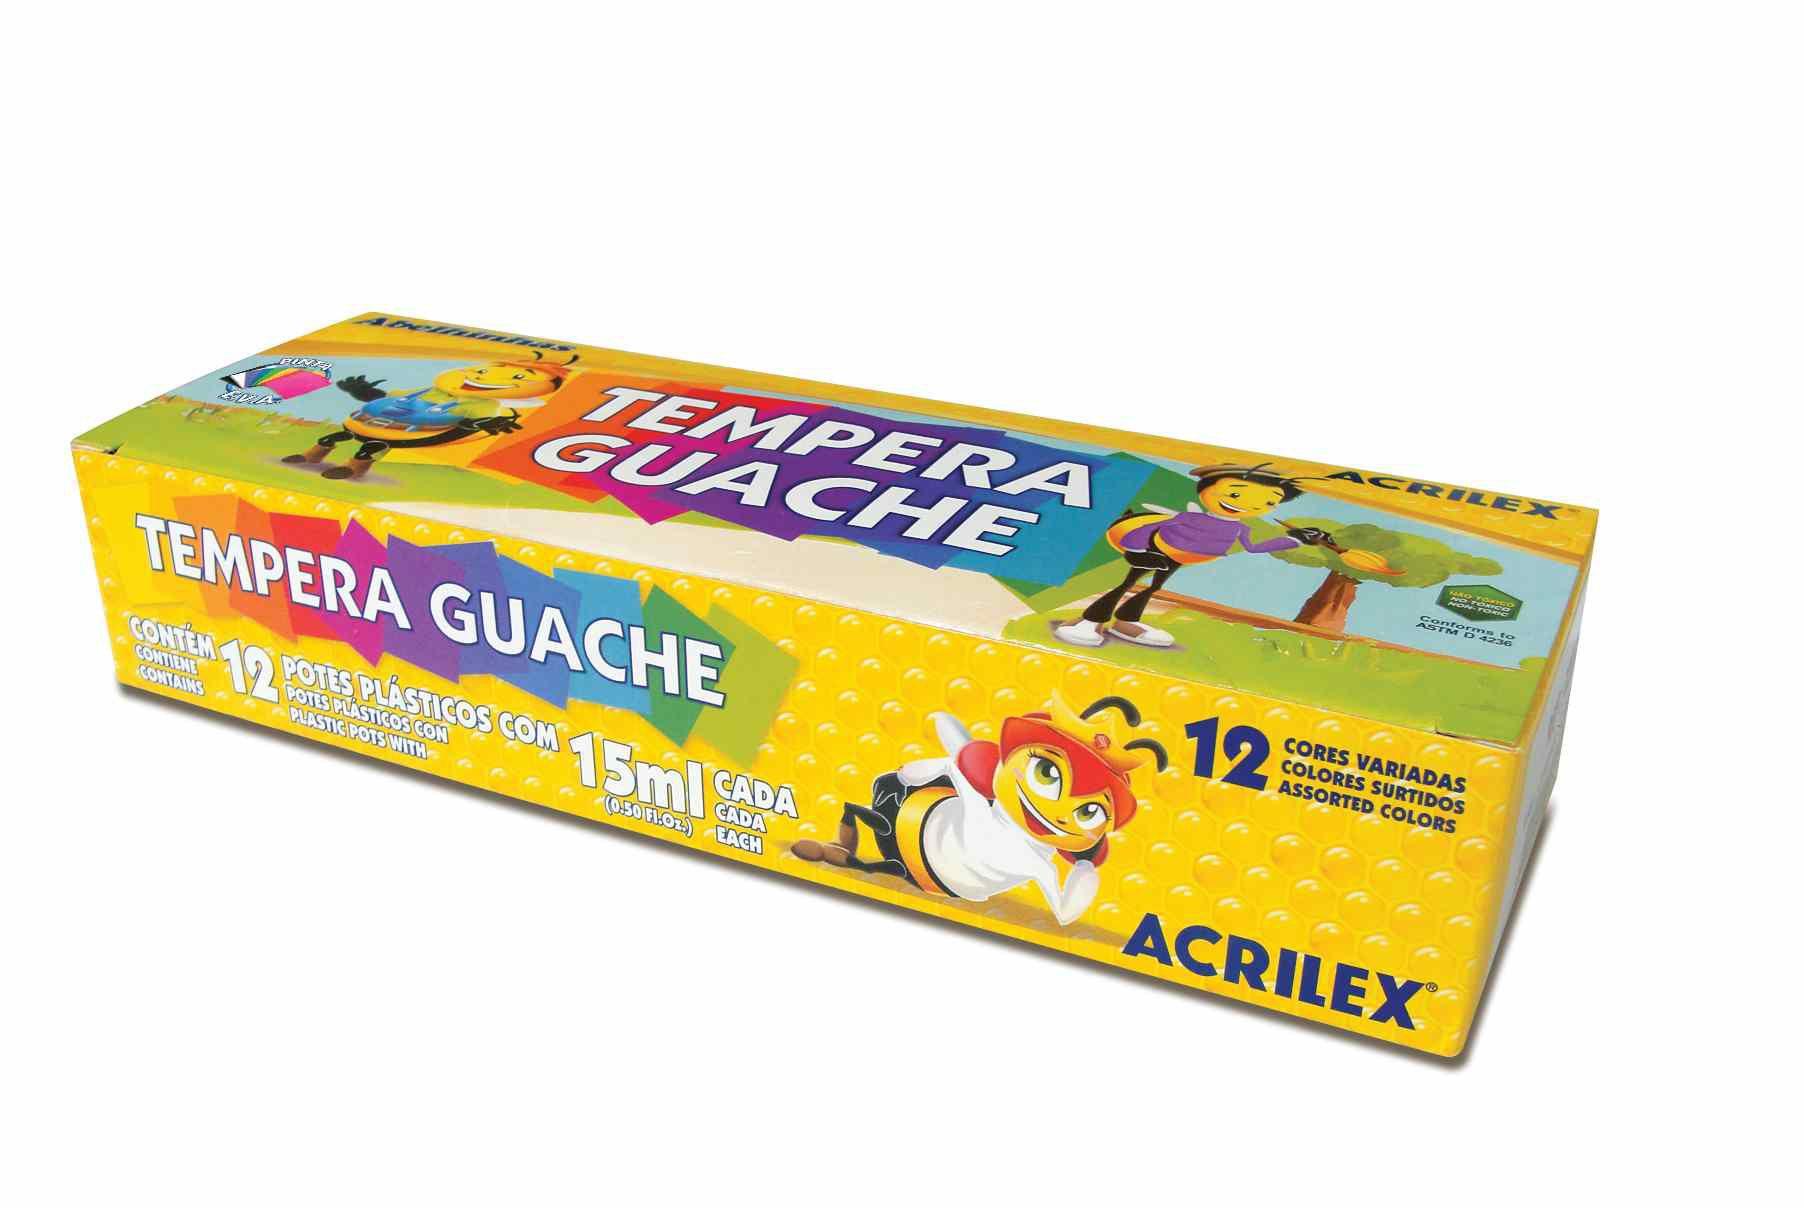 Tinta guache 15ml 12 cores Acrilex